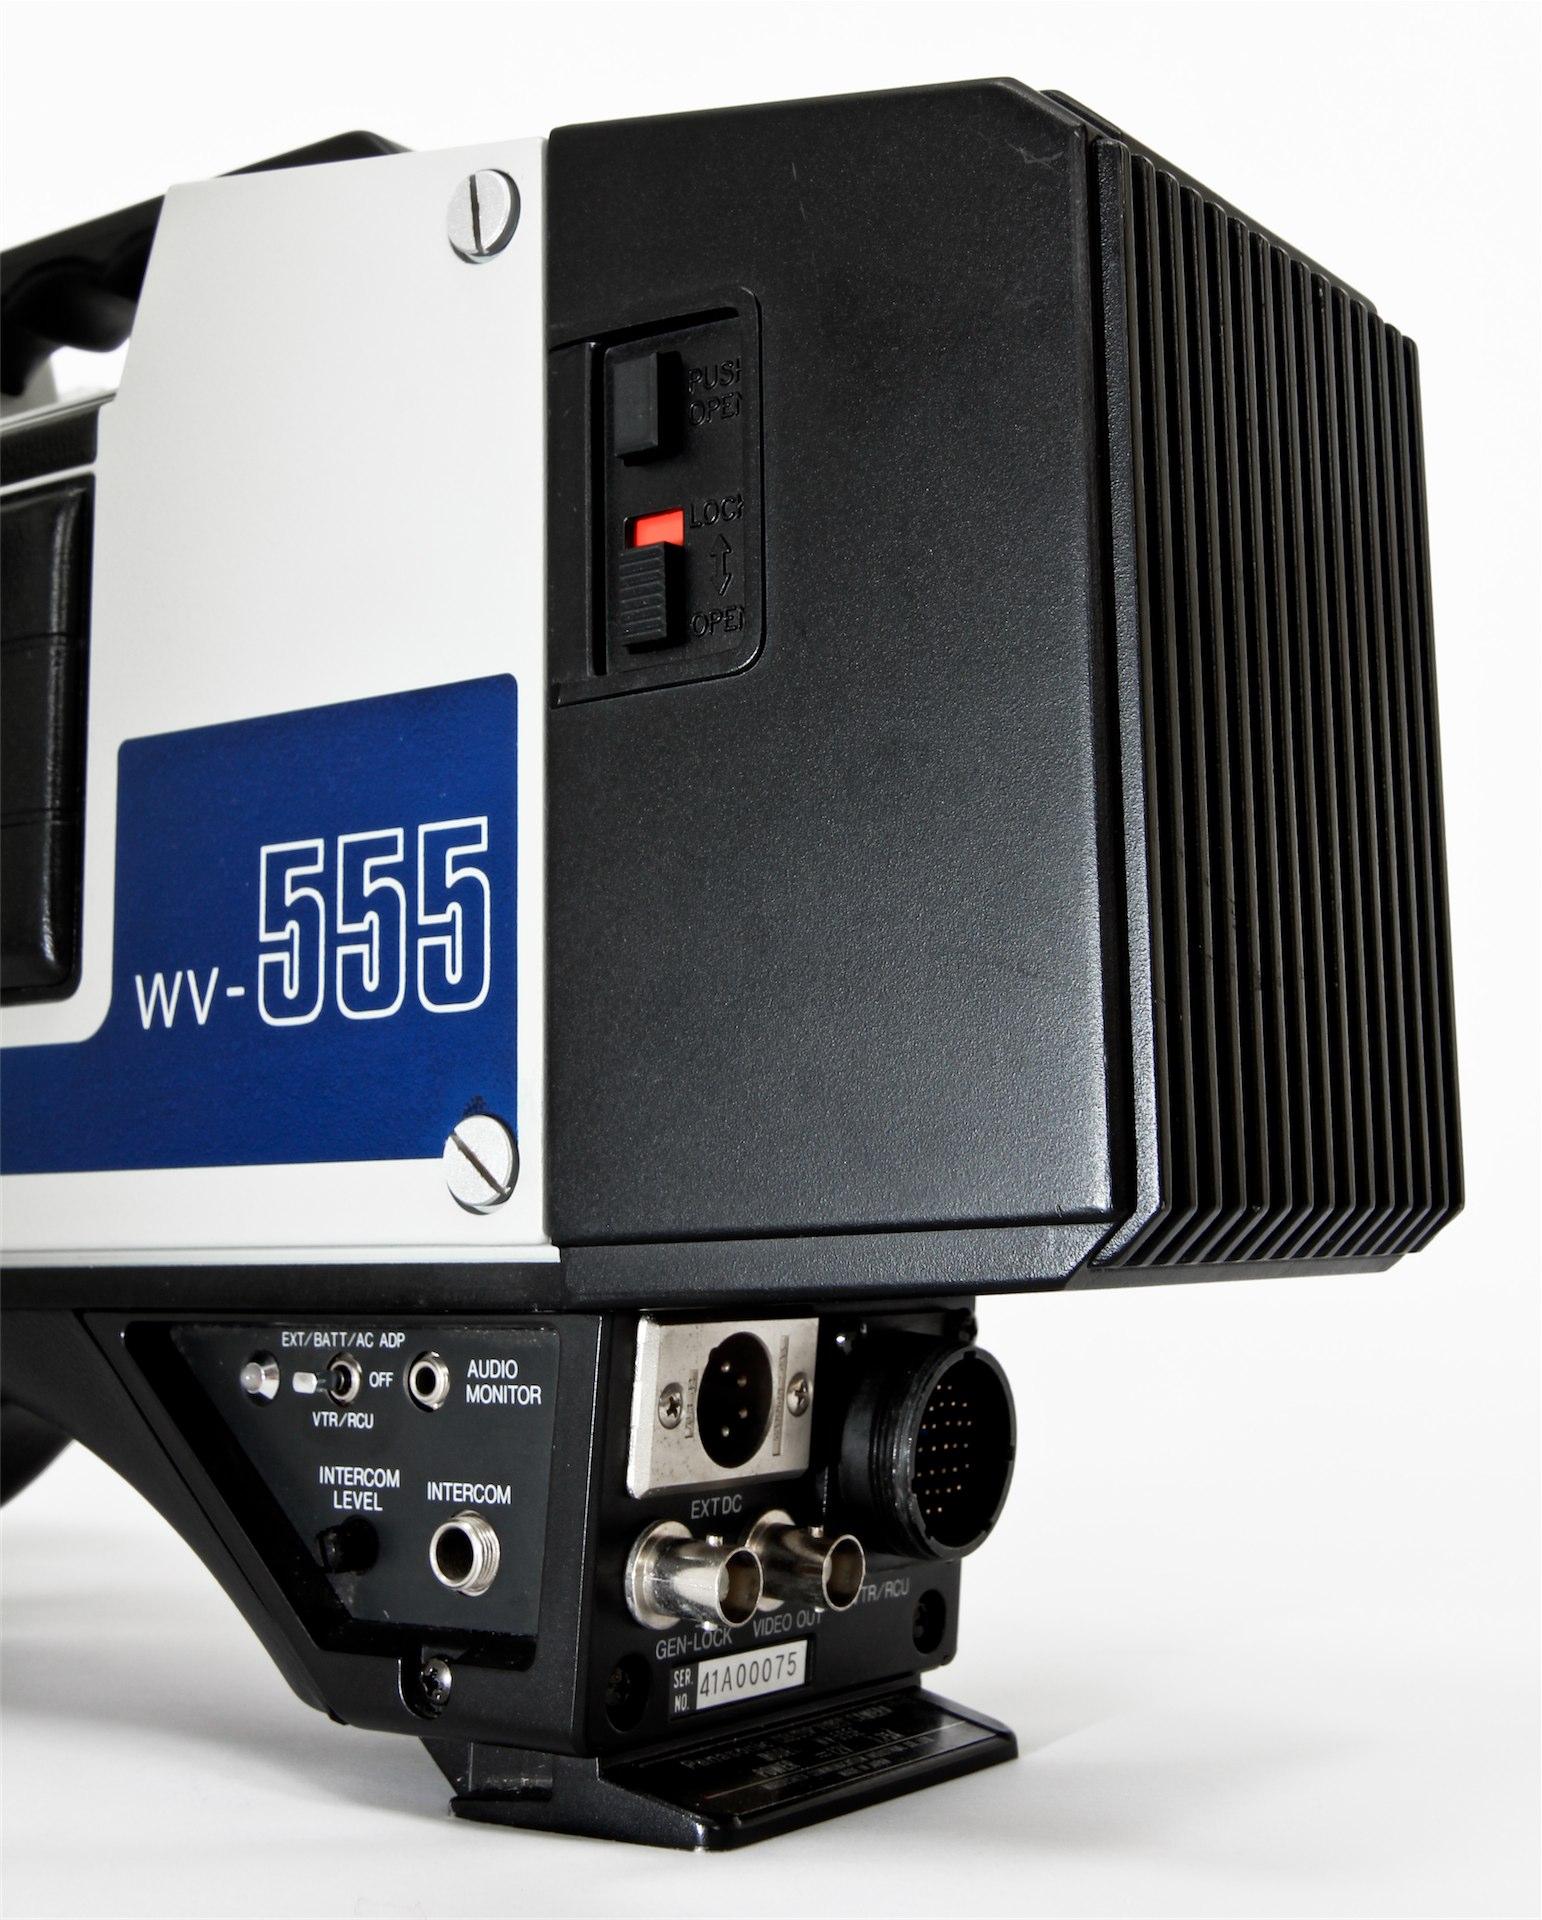 Panasonic WV-555 -  (19 von 19)_1